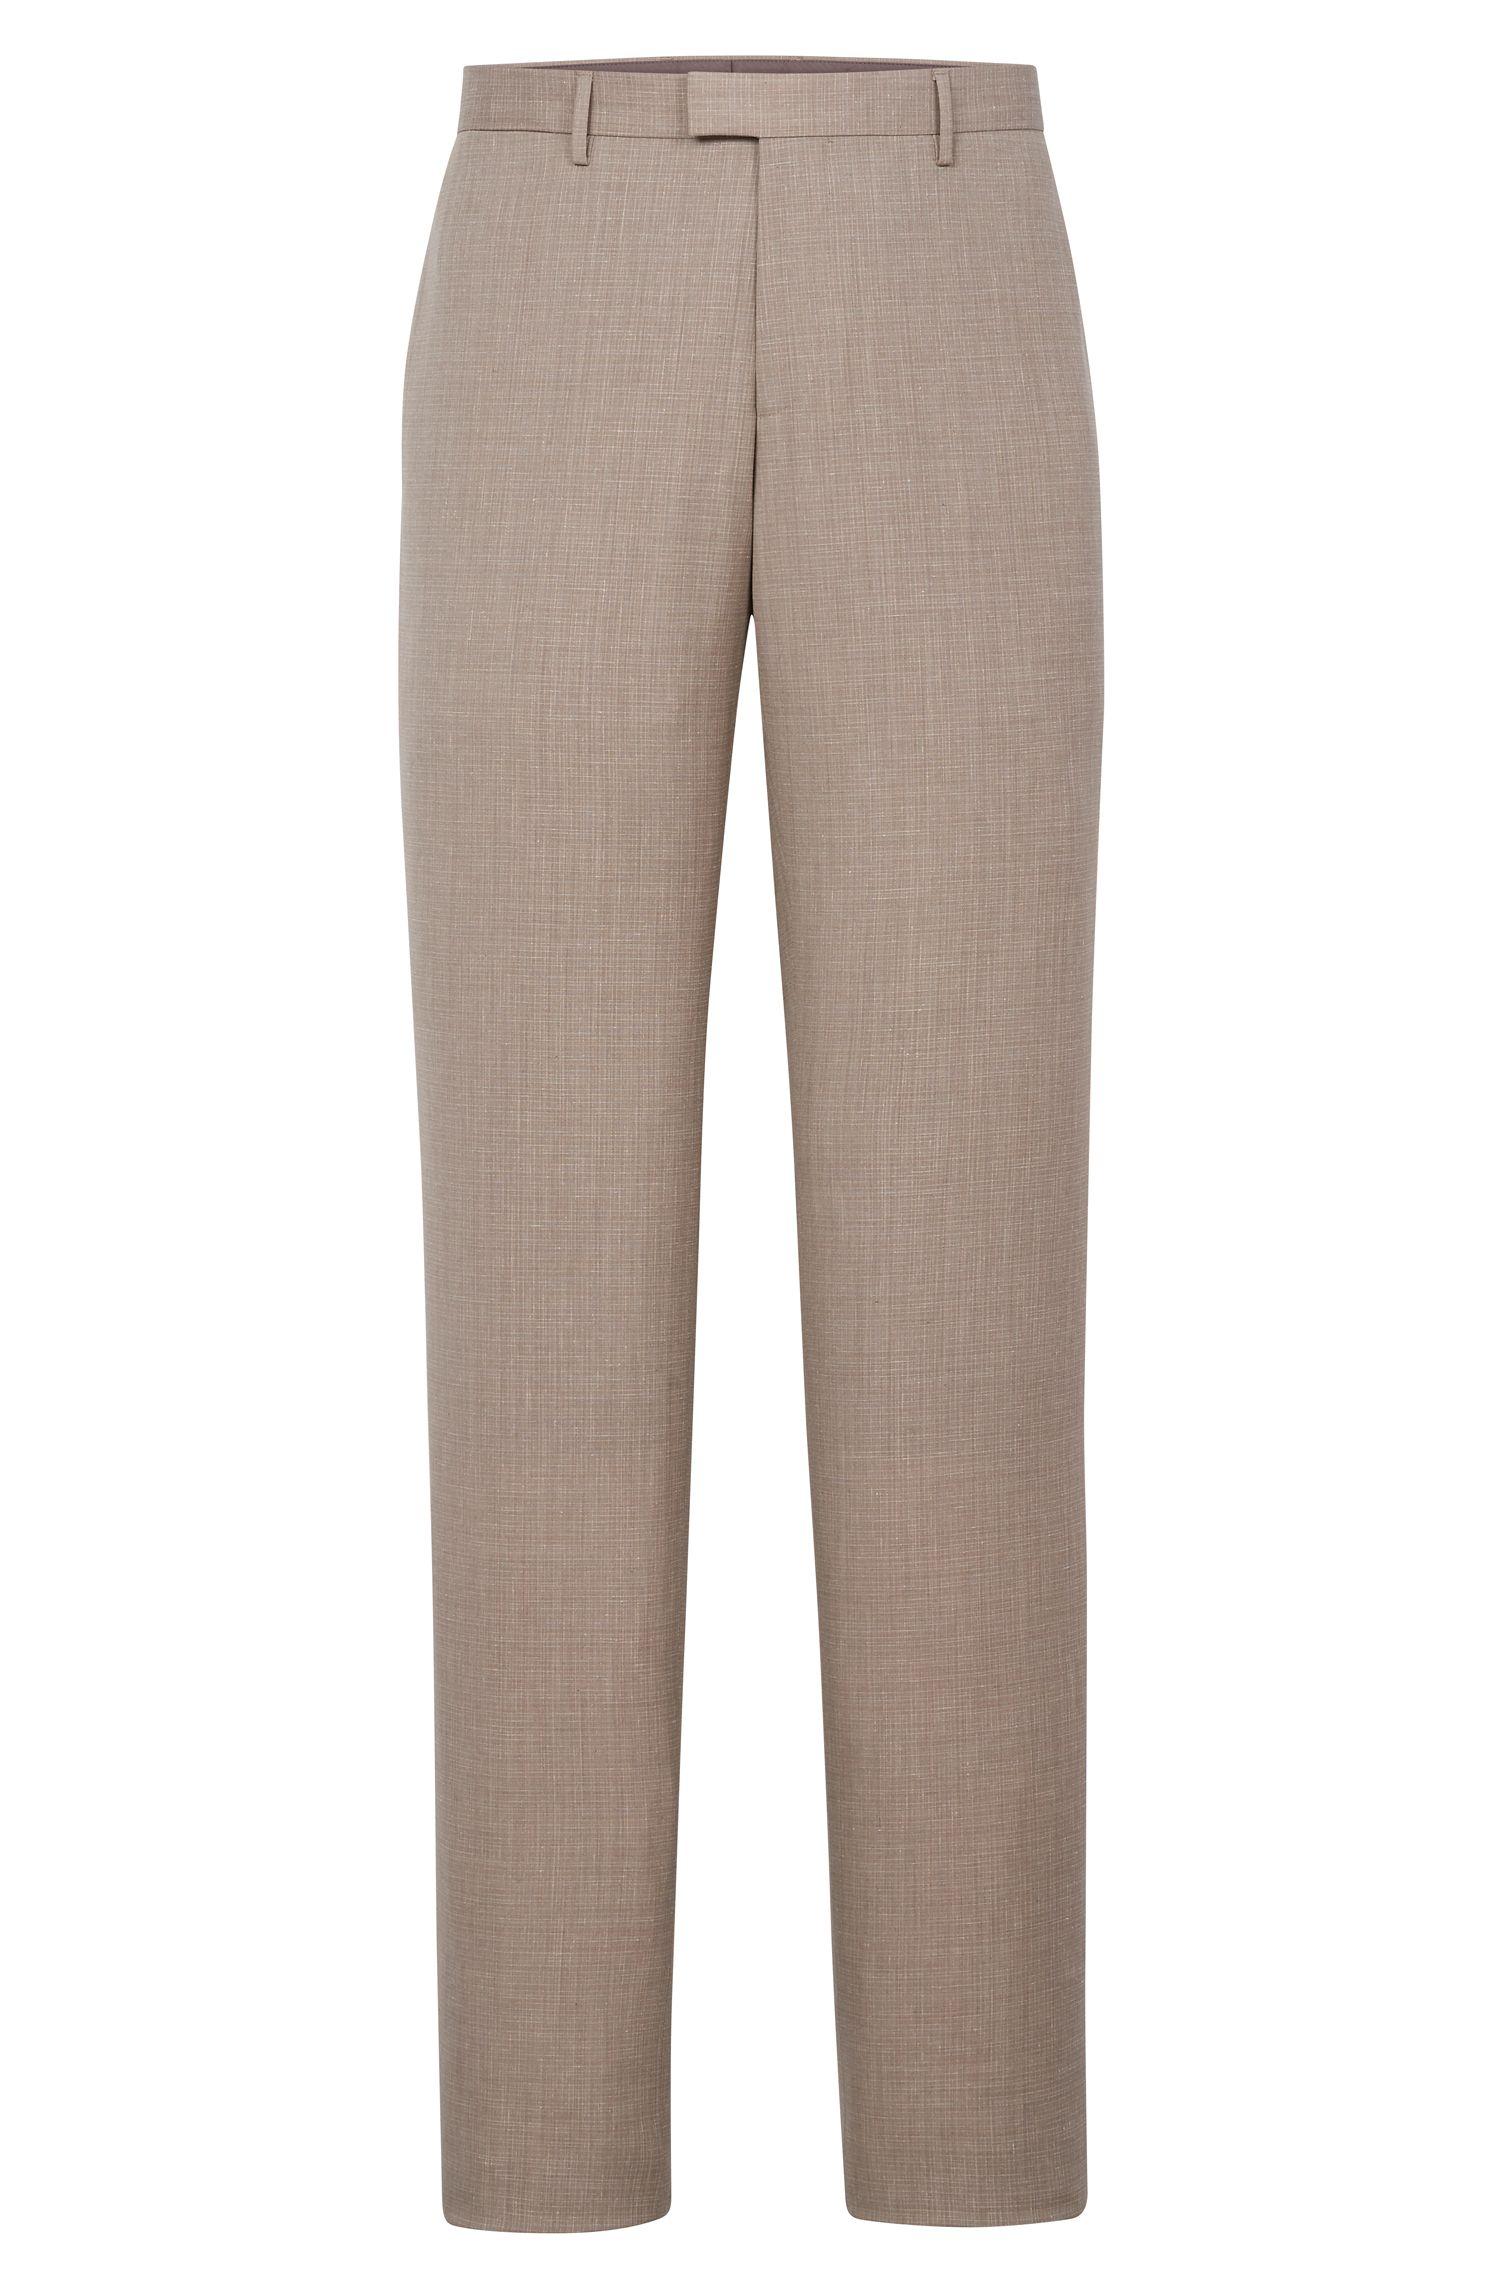 'T-Gary' | Slim Fit, Italian Wool Cotton Silk Linen Dress Pants